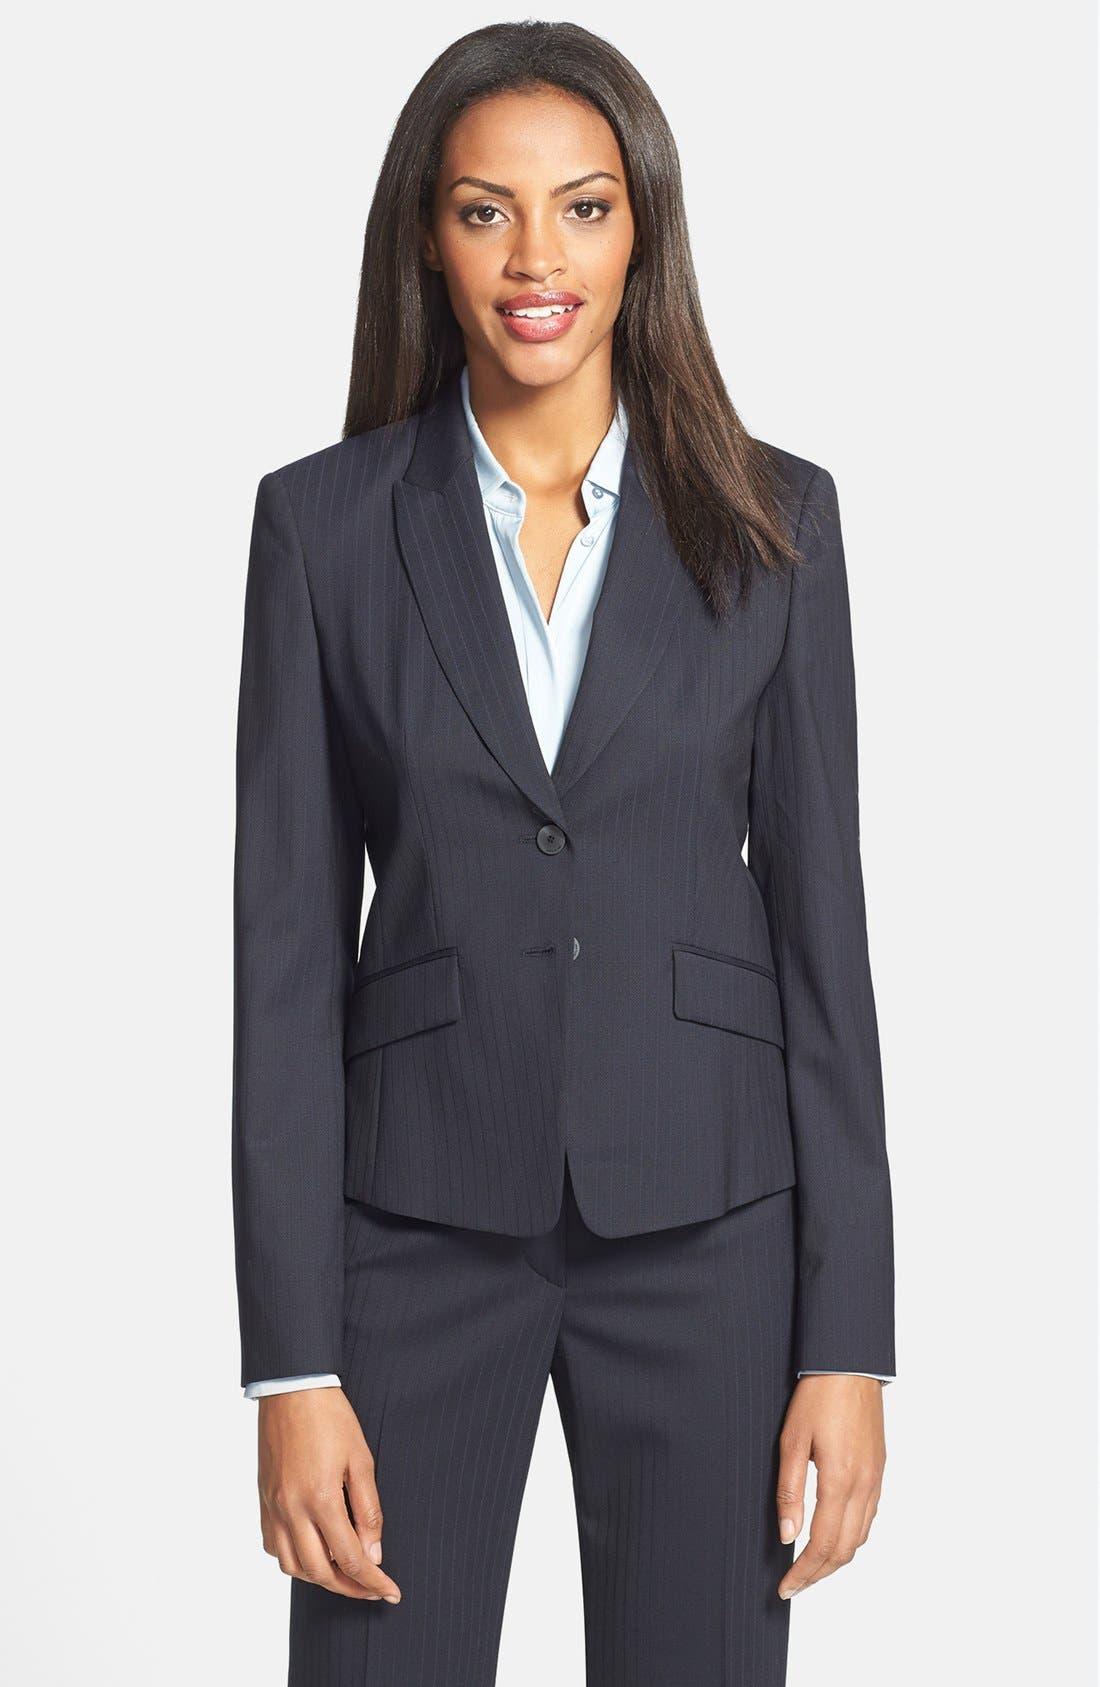 Alternate Image 1 Selected - BOSS HUGO BOSS 'Juljanella 1' Two-Button Pinstripe Jacket